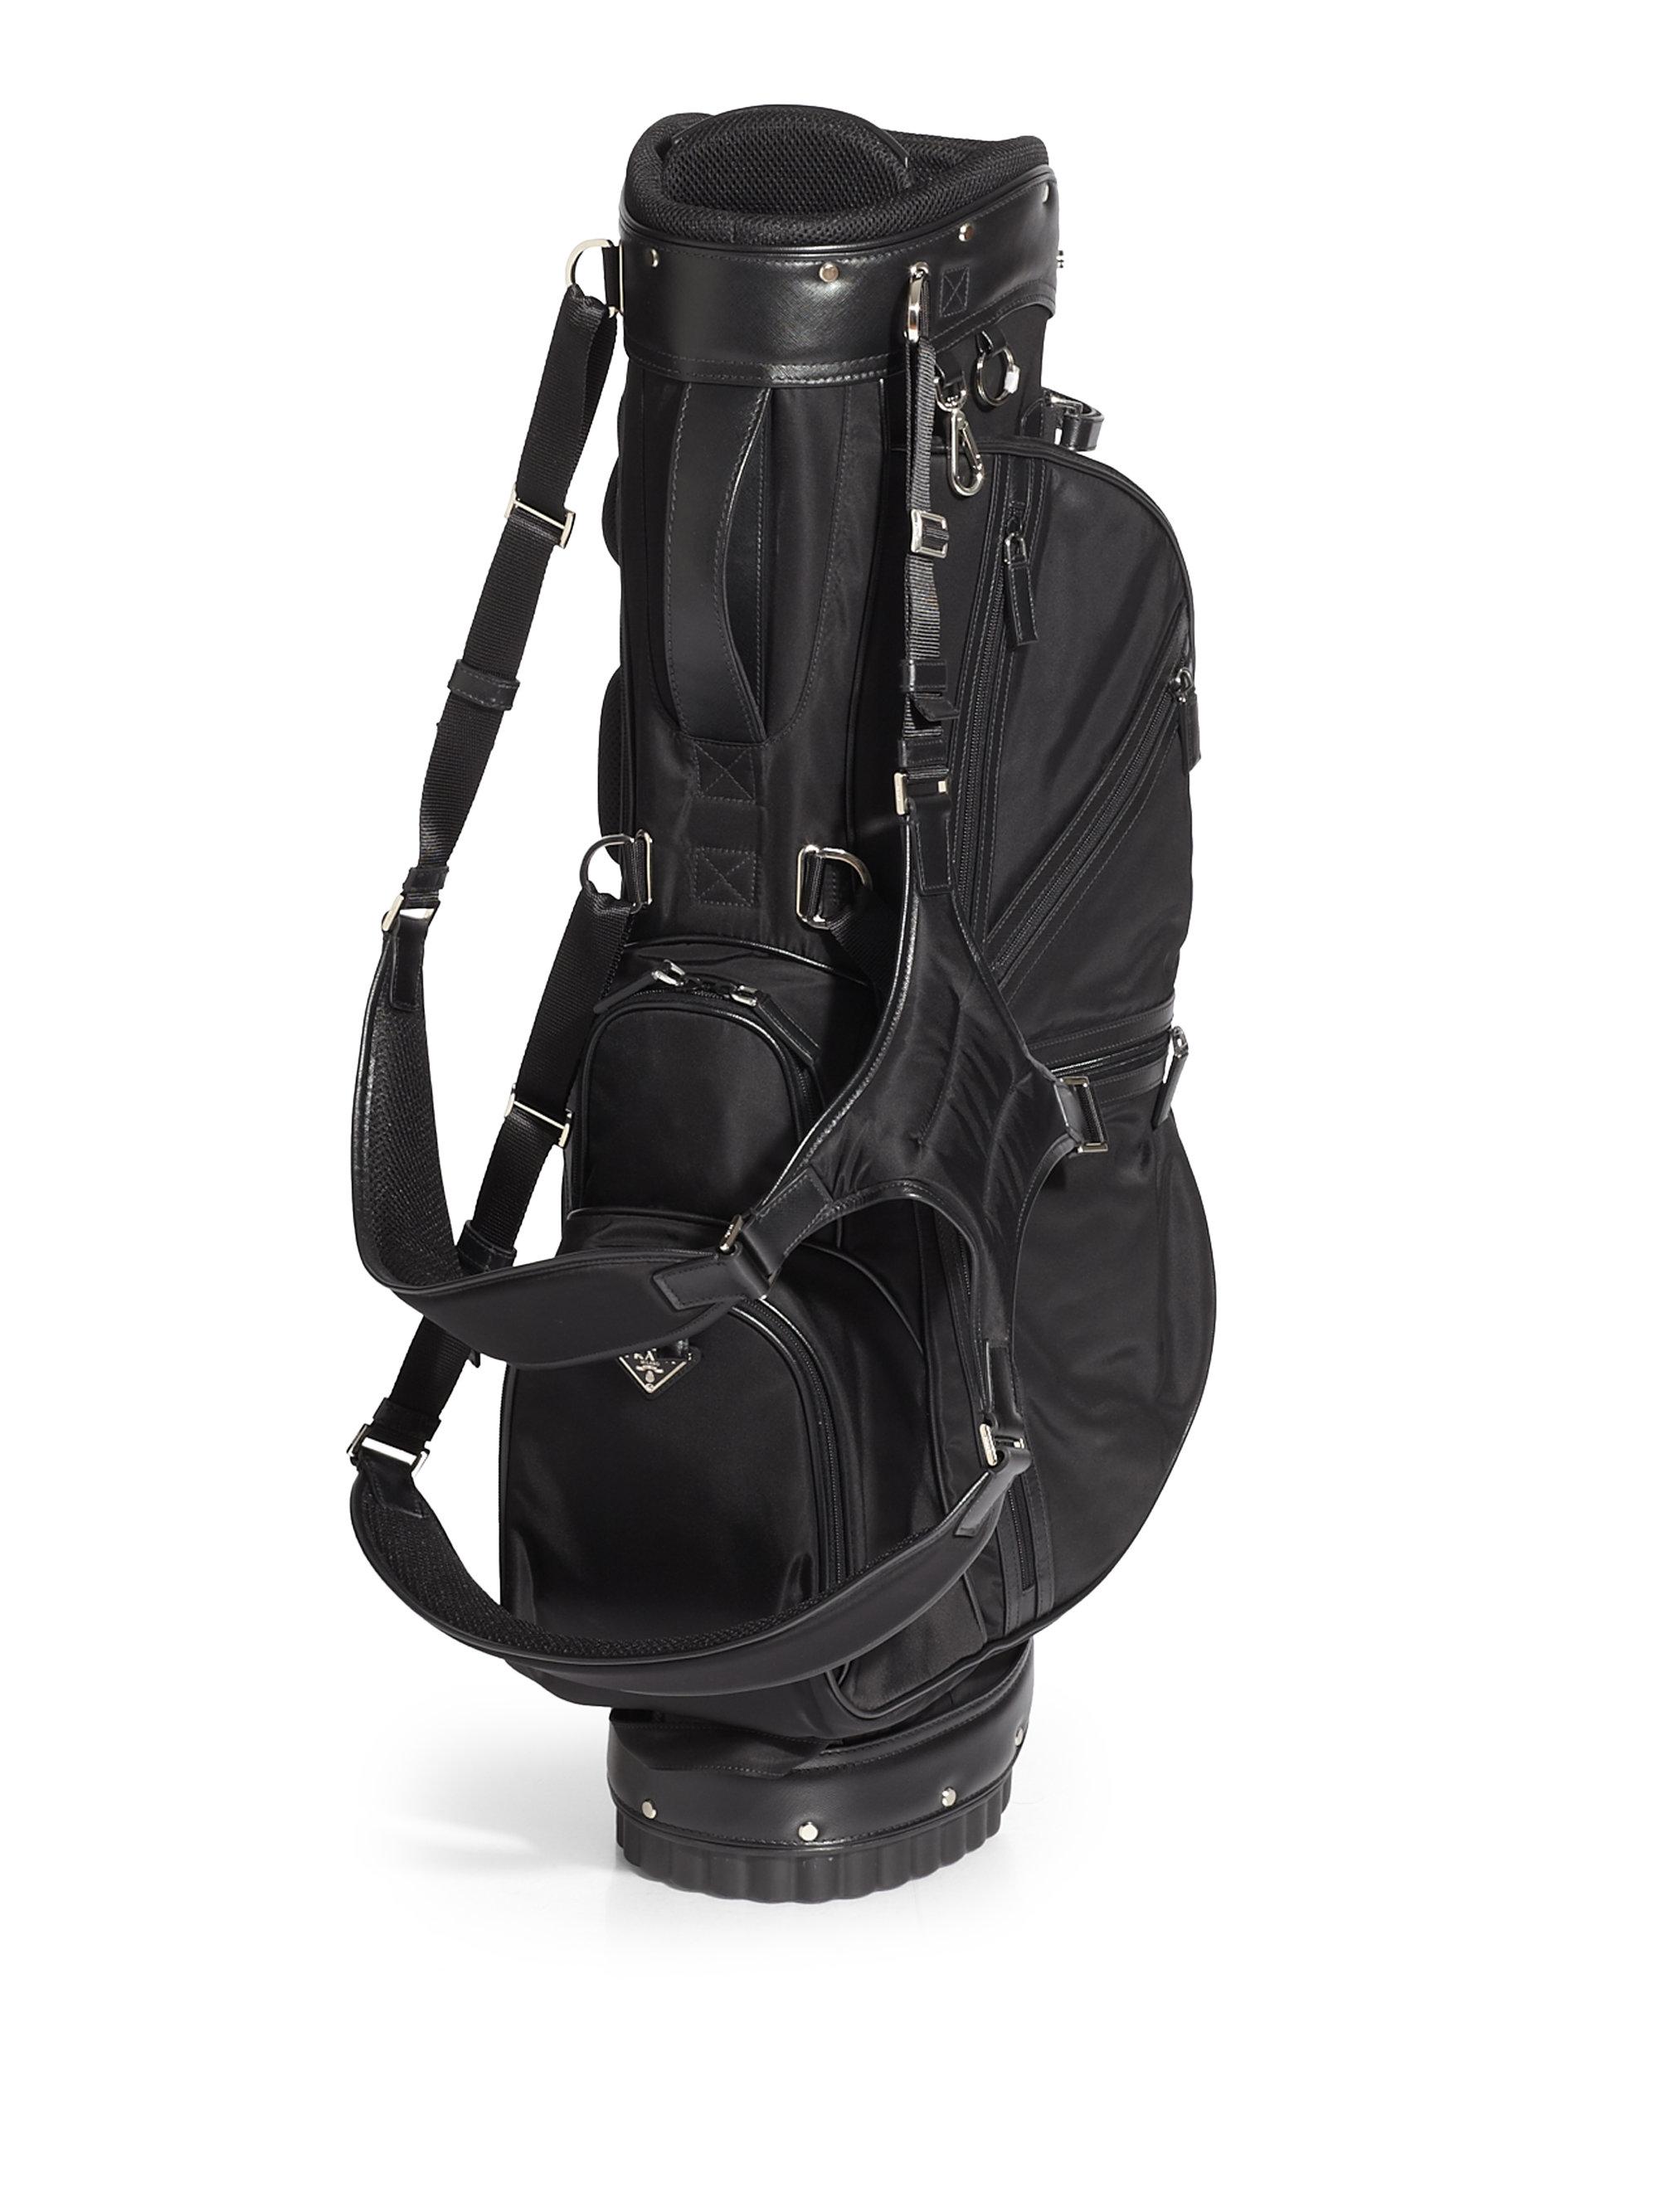 387bedf6dc5e Prada Nylon Golf Bag in Black for Men - Lyst